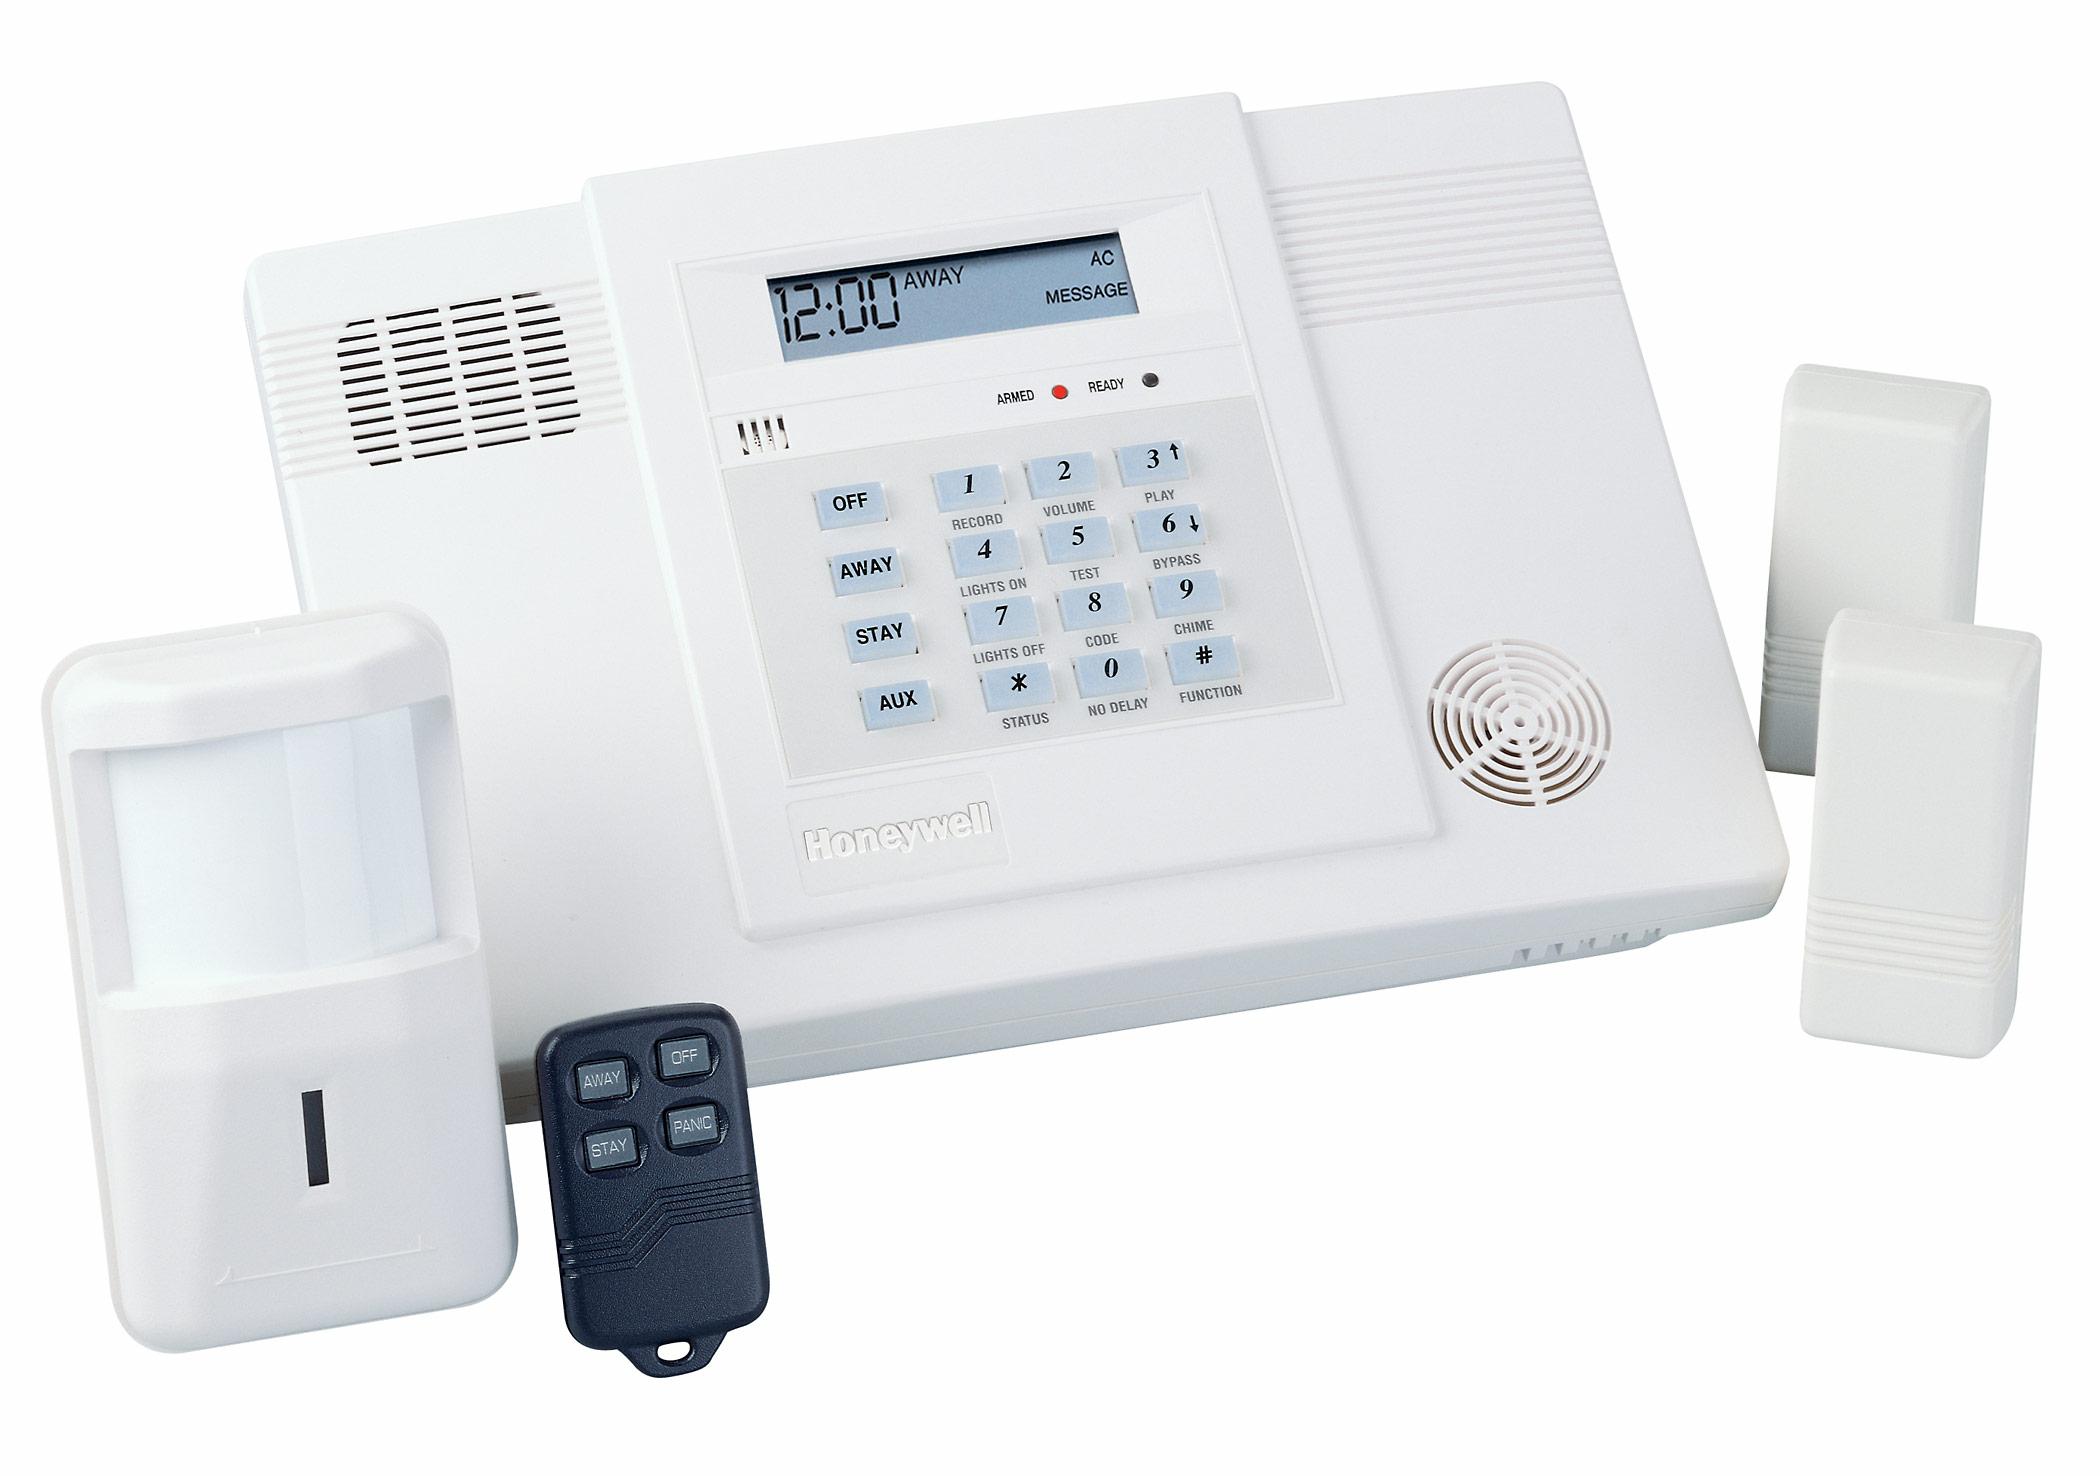 wireless alarm system honeywell wireless alarm system manual. Black Bedroom Furniture Sets. Home Design Ideas